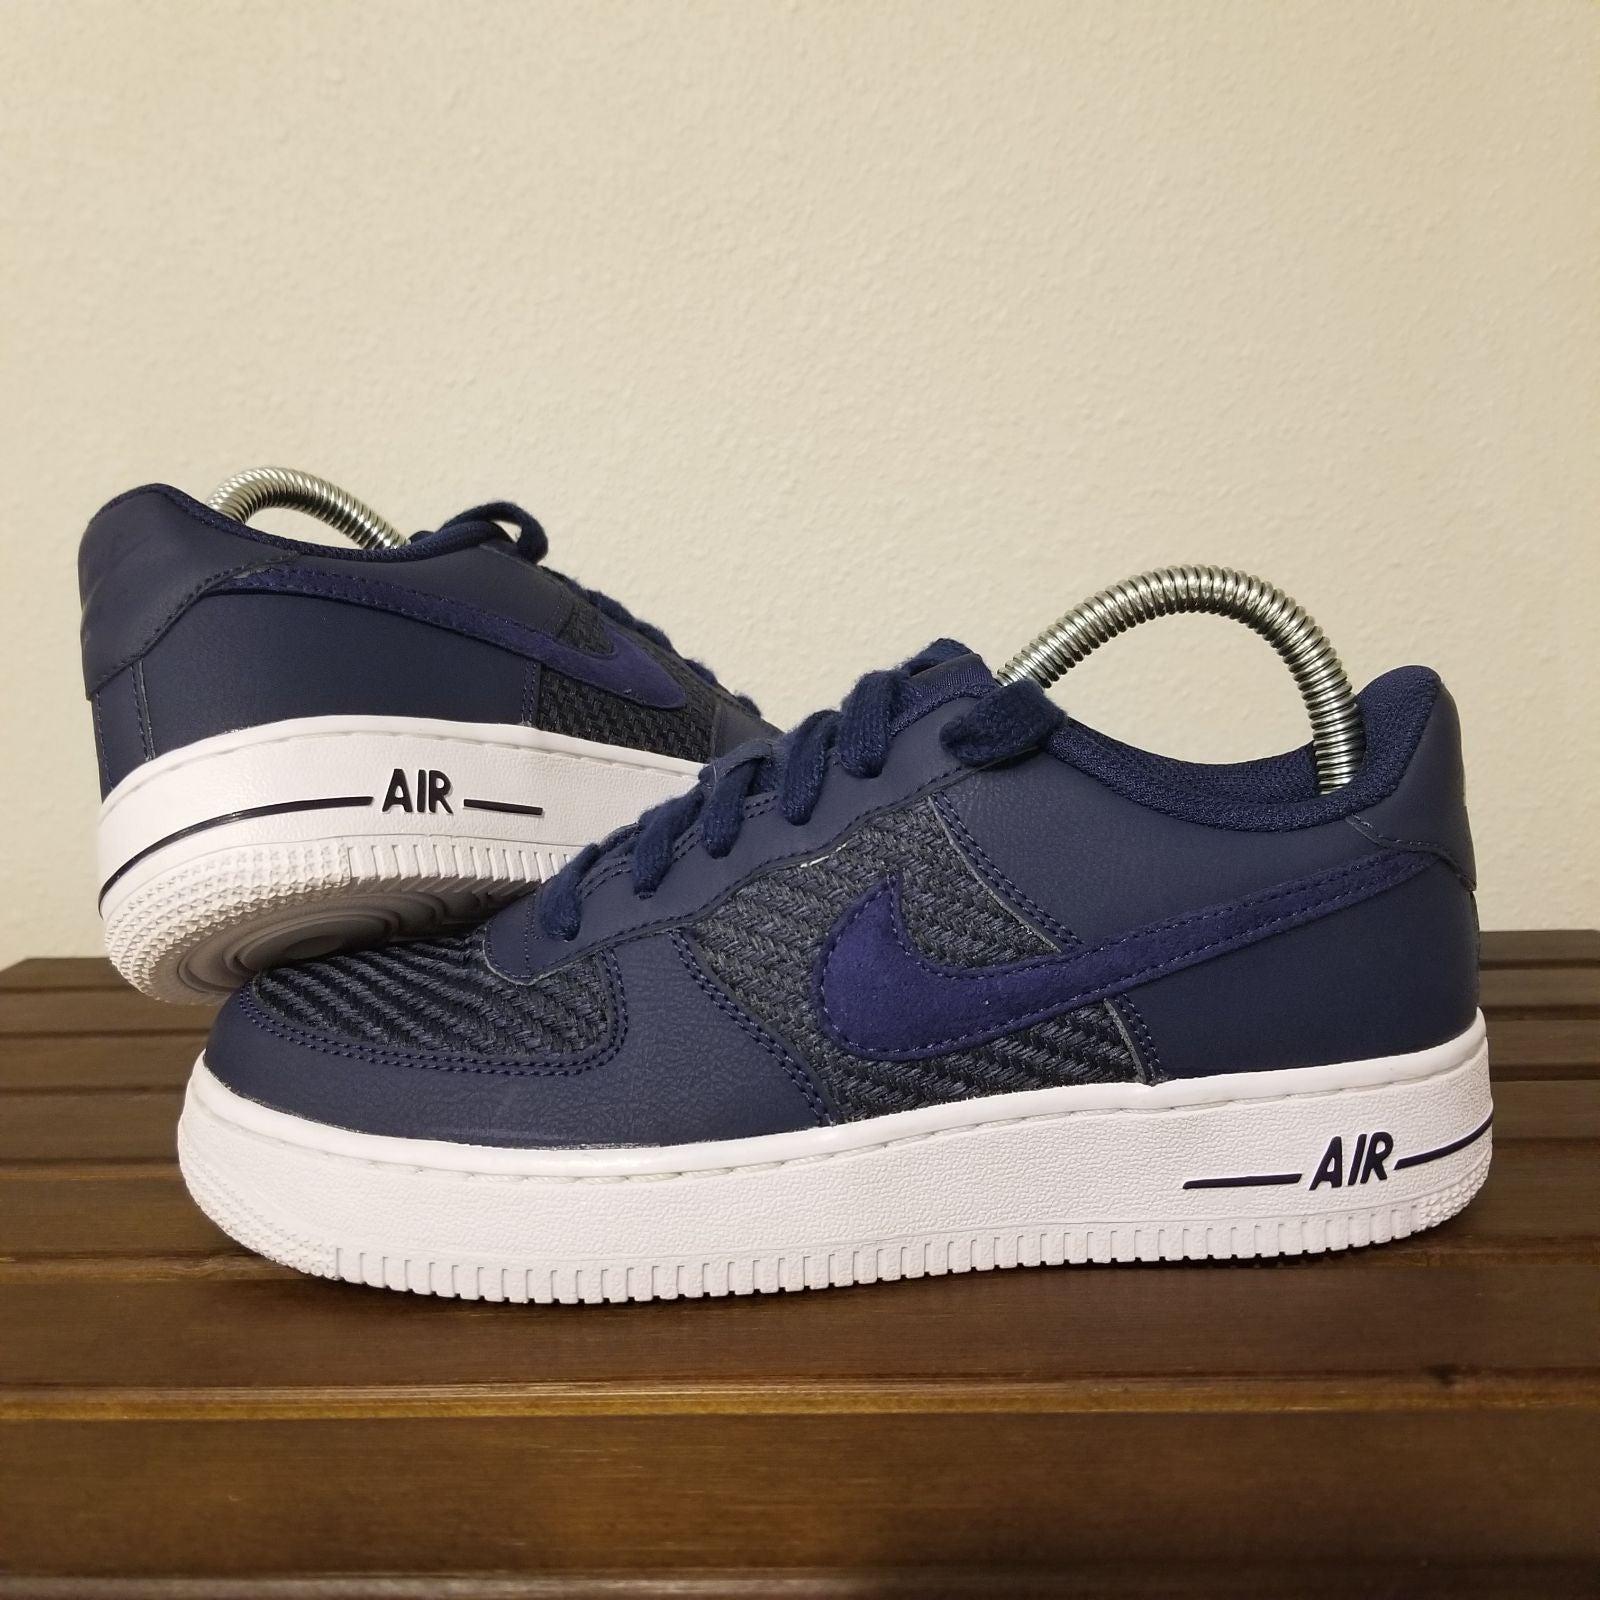 Nike Air Force 1 LV8 Navy White 7